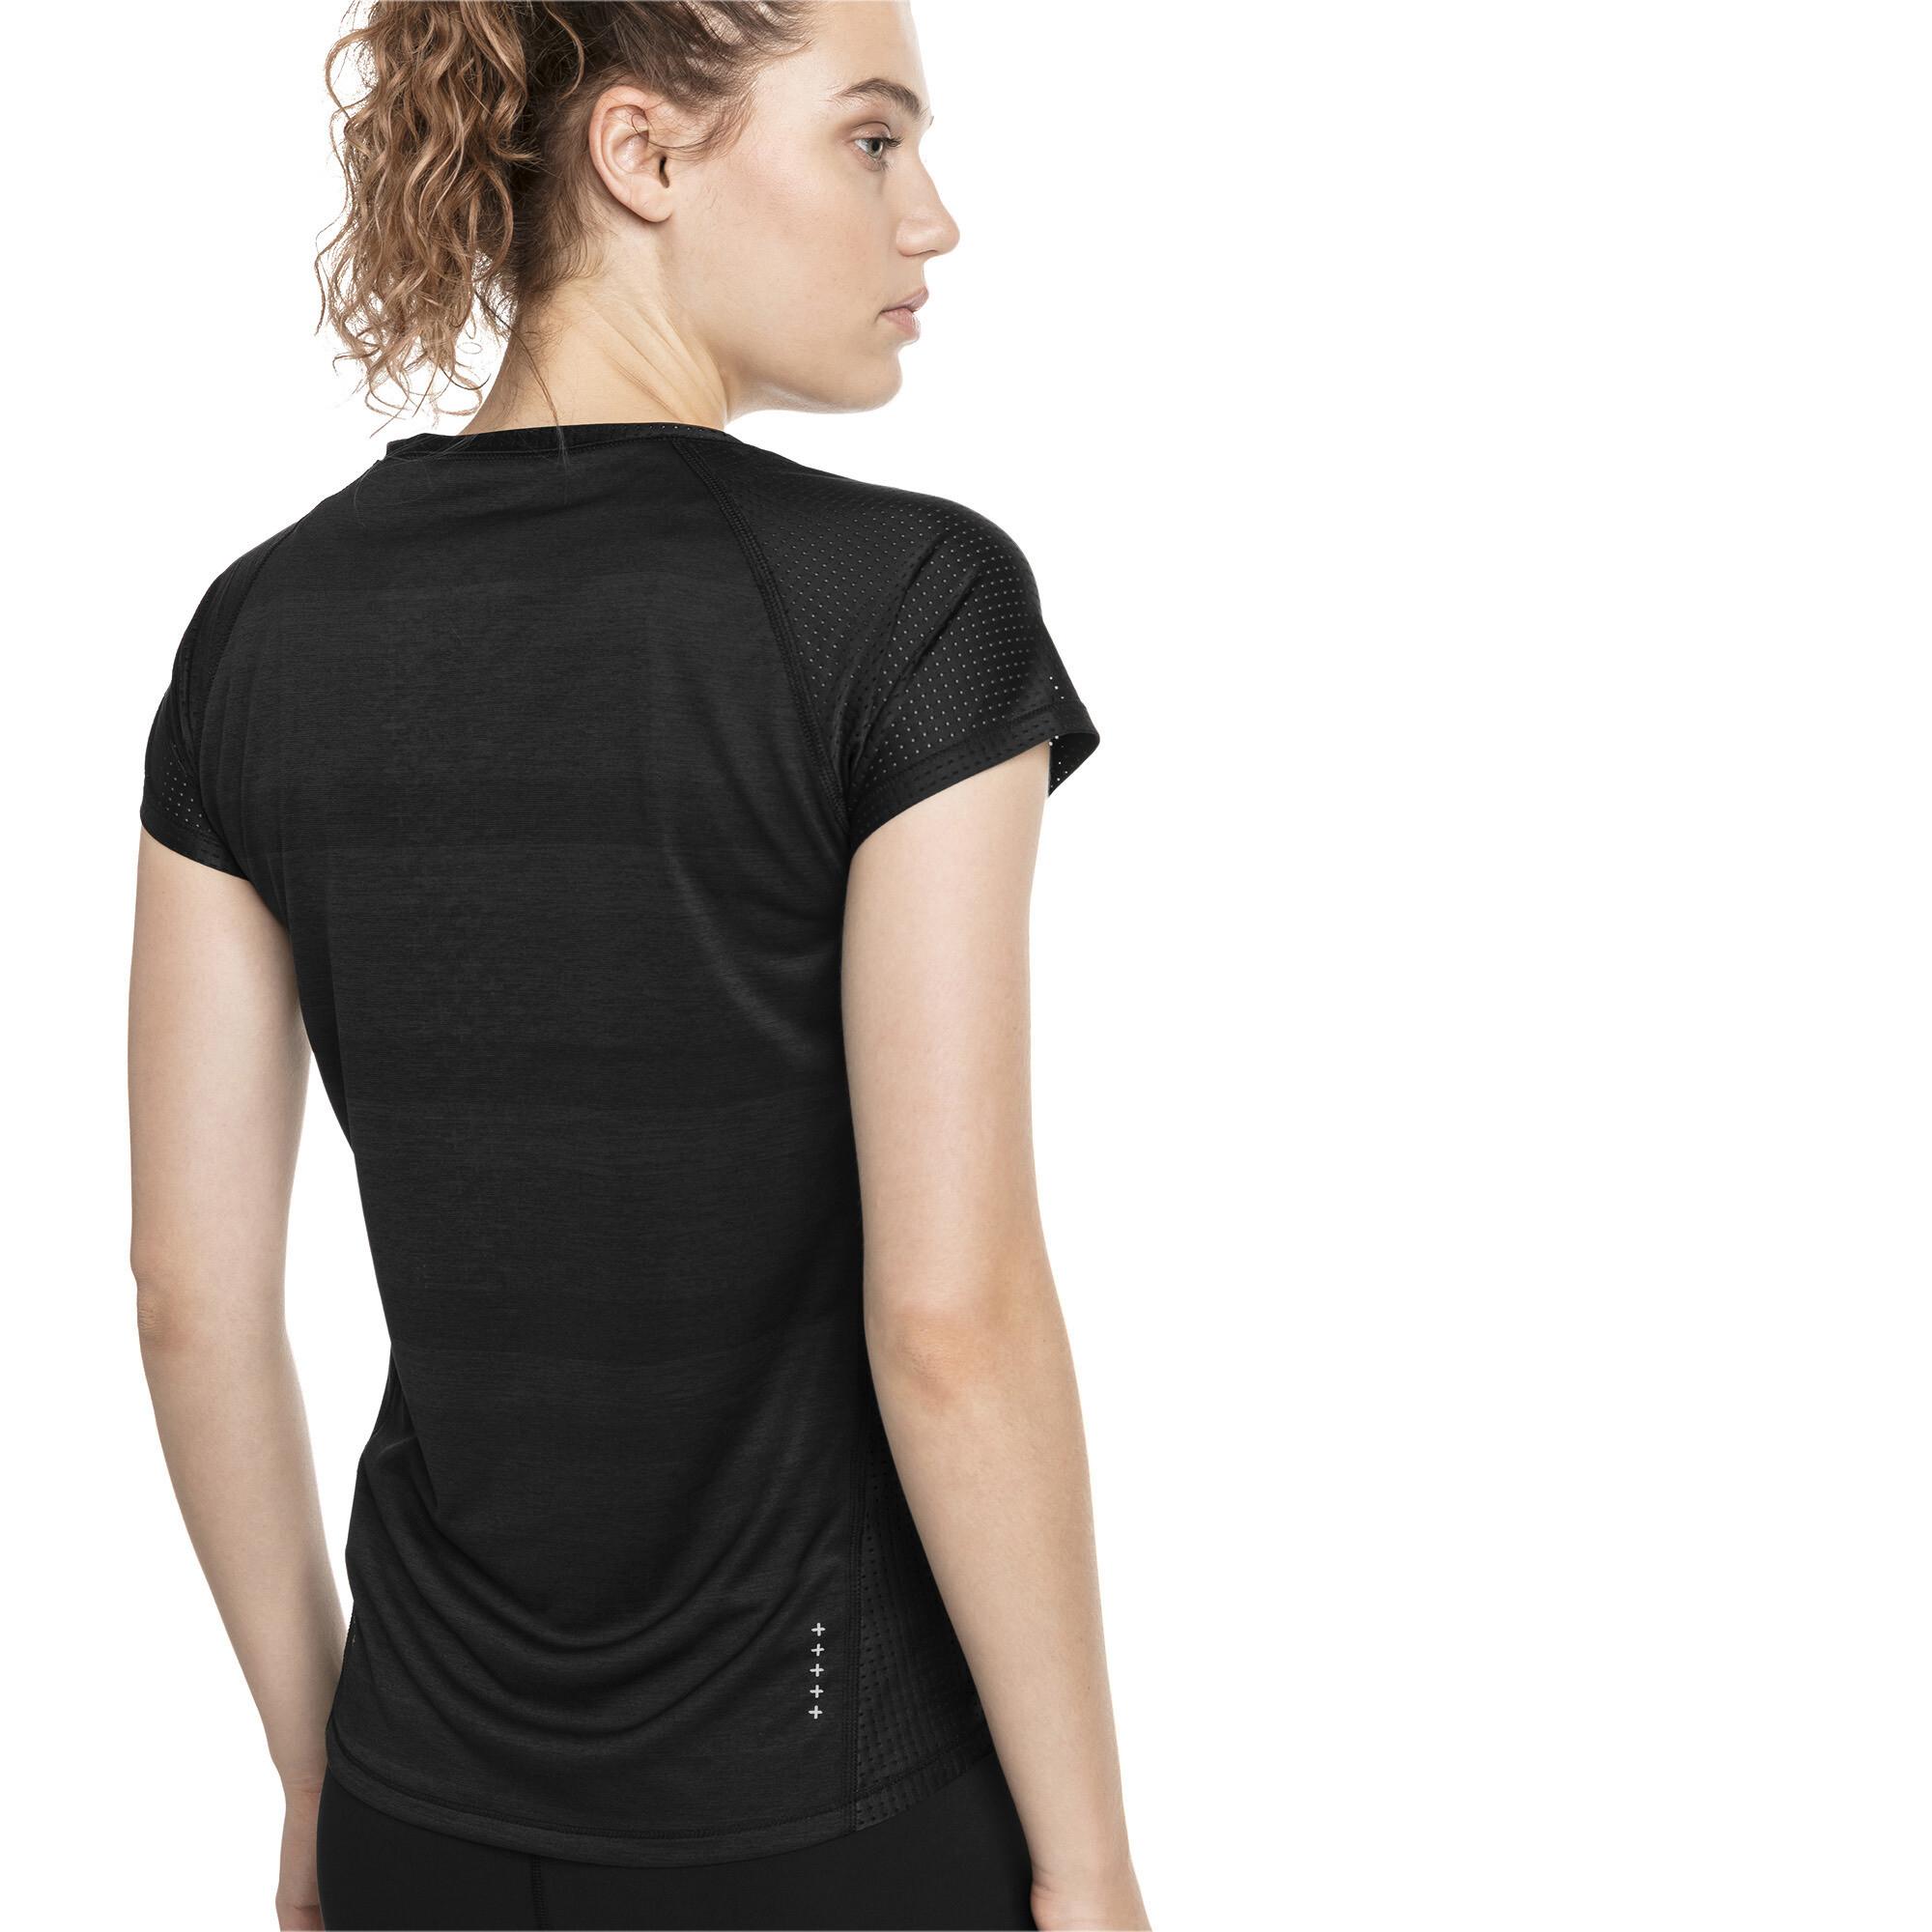 Image Puma Thermo-R+ Short Sleeve Women's Running Tee #2